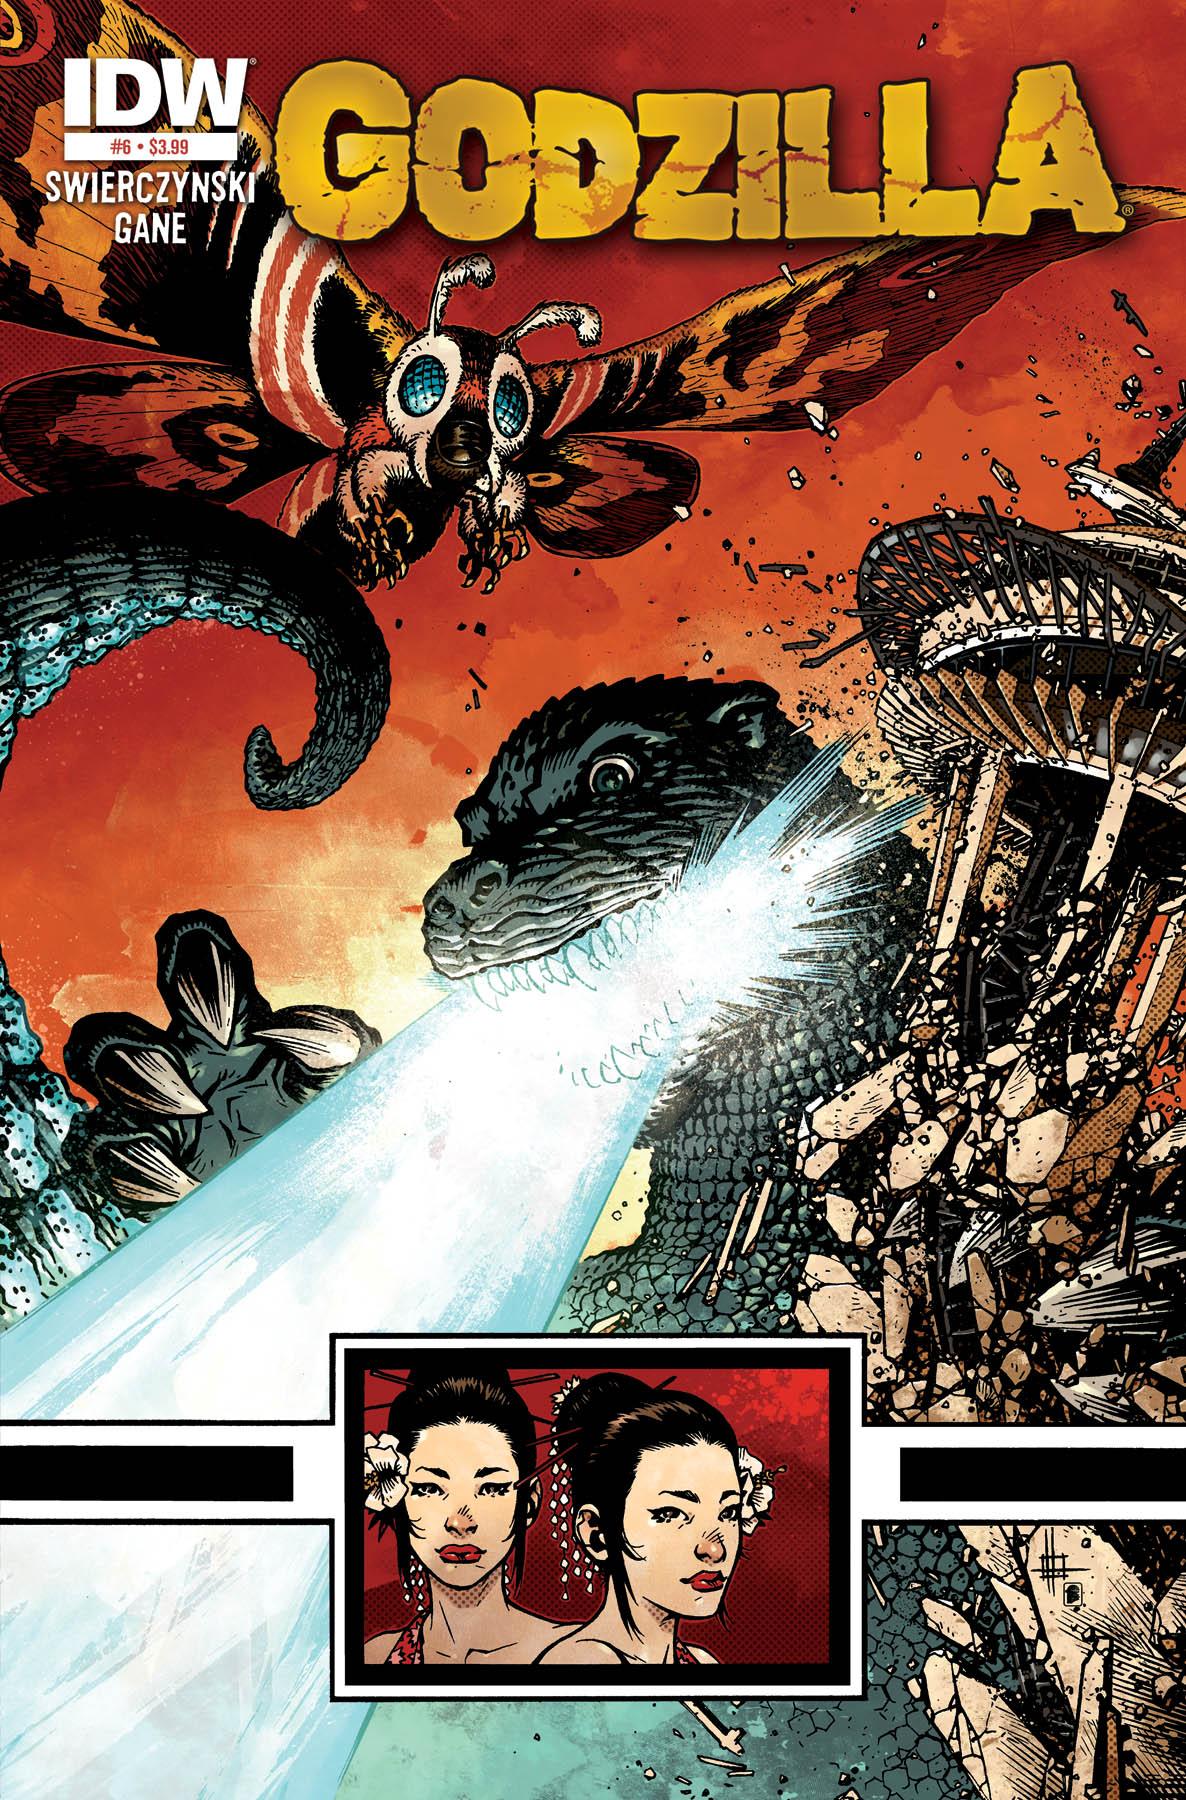 Godzilla 06 CvrA GODZILLA #6 Review